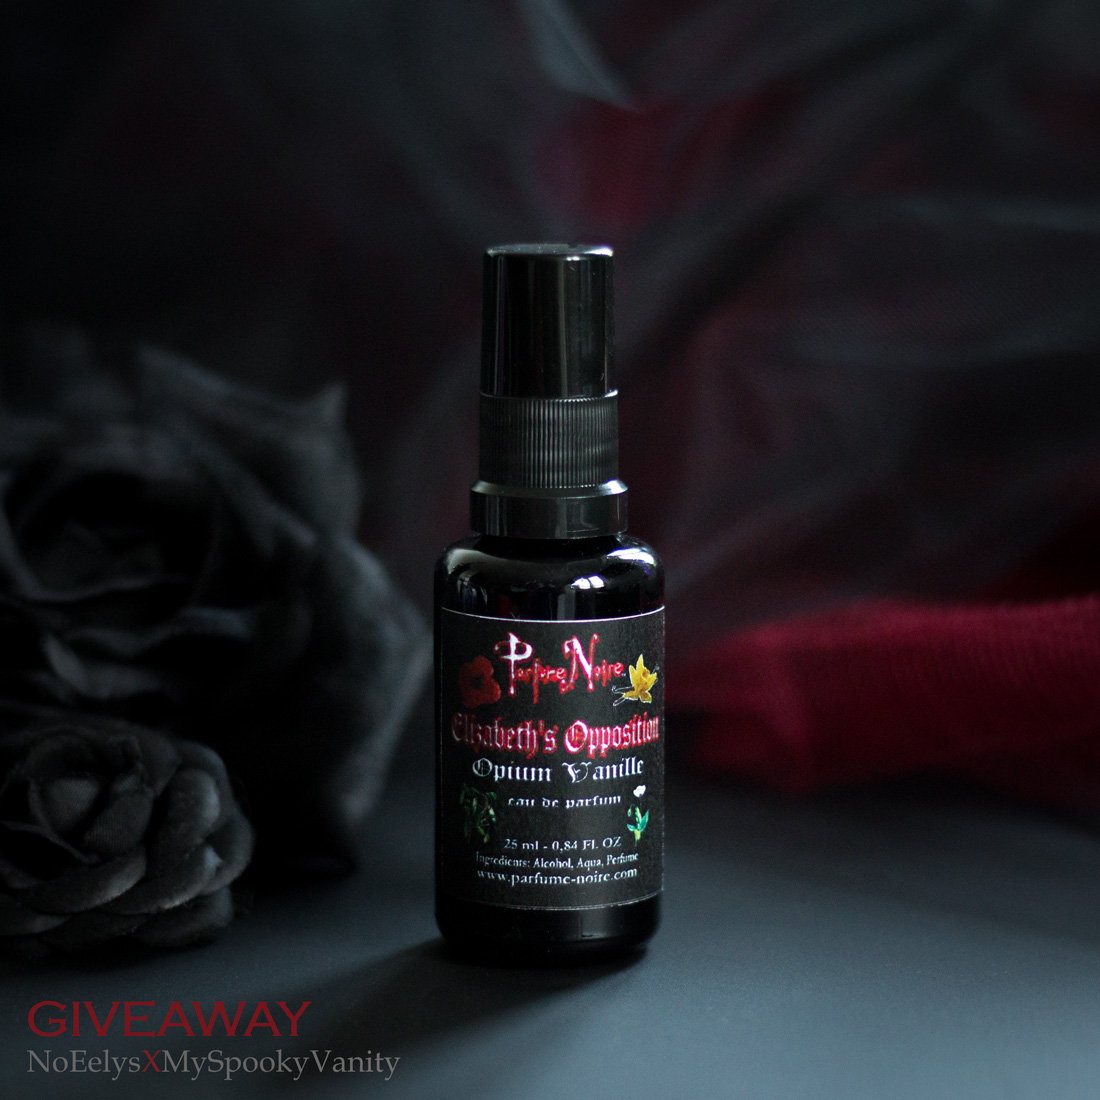 My Spooky Vanity Parfume Noire Elizabeth's Opposition Opium Vanille parfum gothique